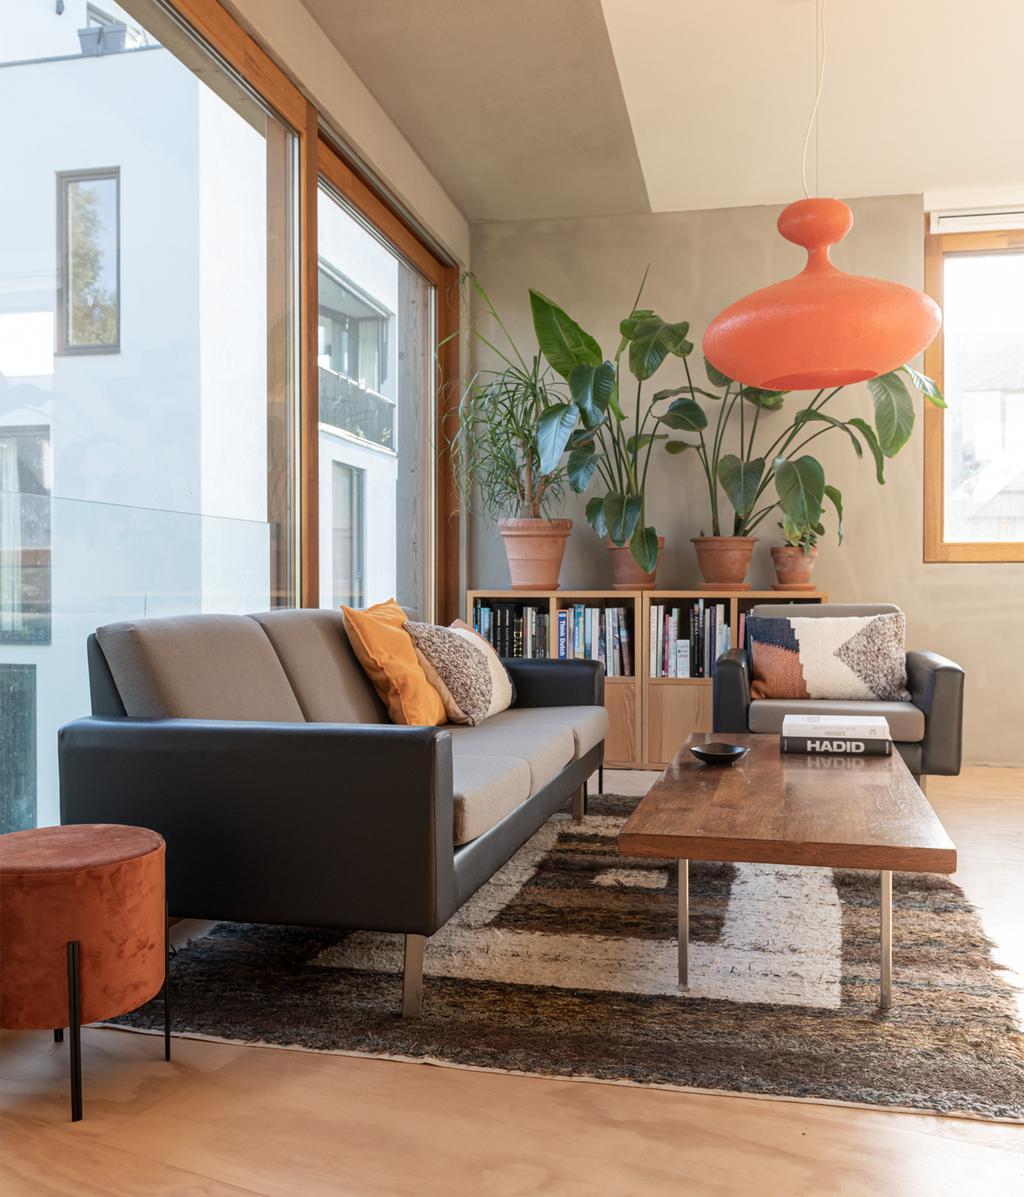 Kunstzinnig huis | Woonkamer | vtwonen 01-2021